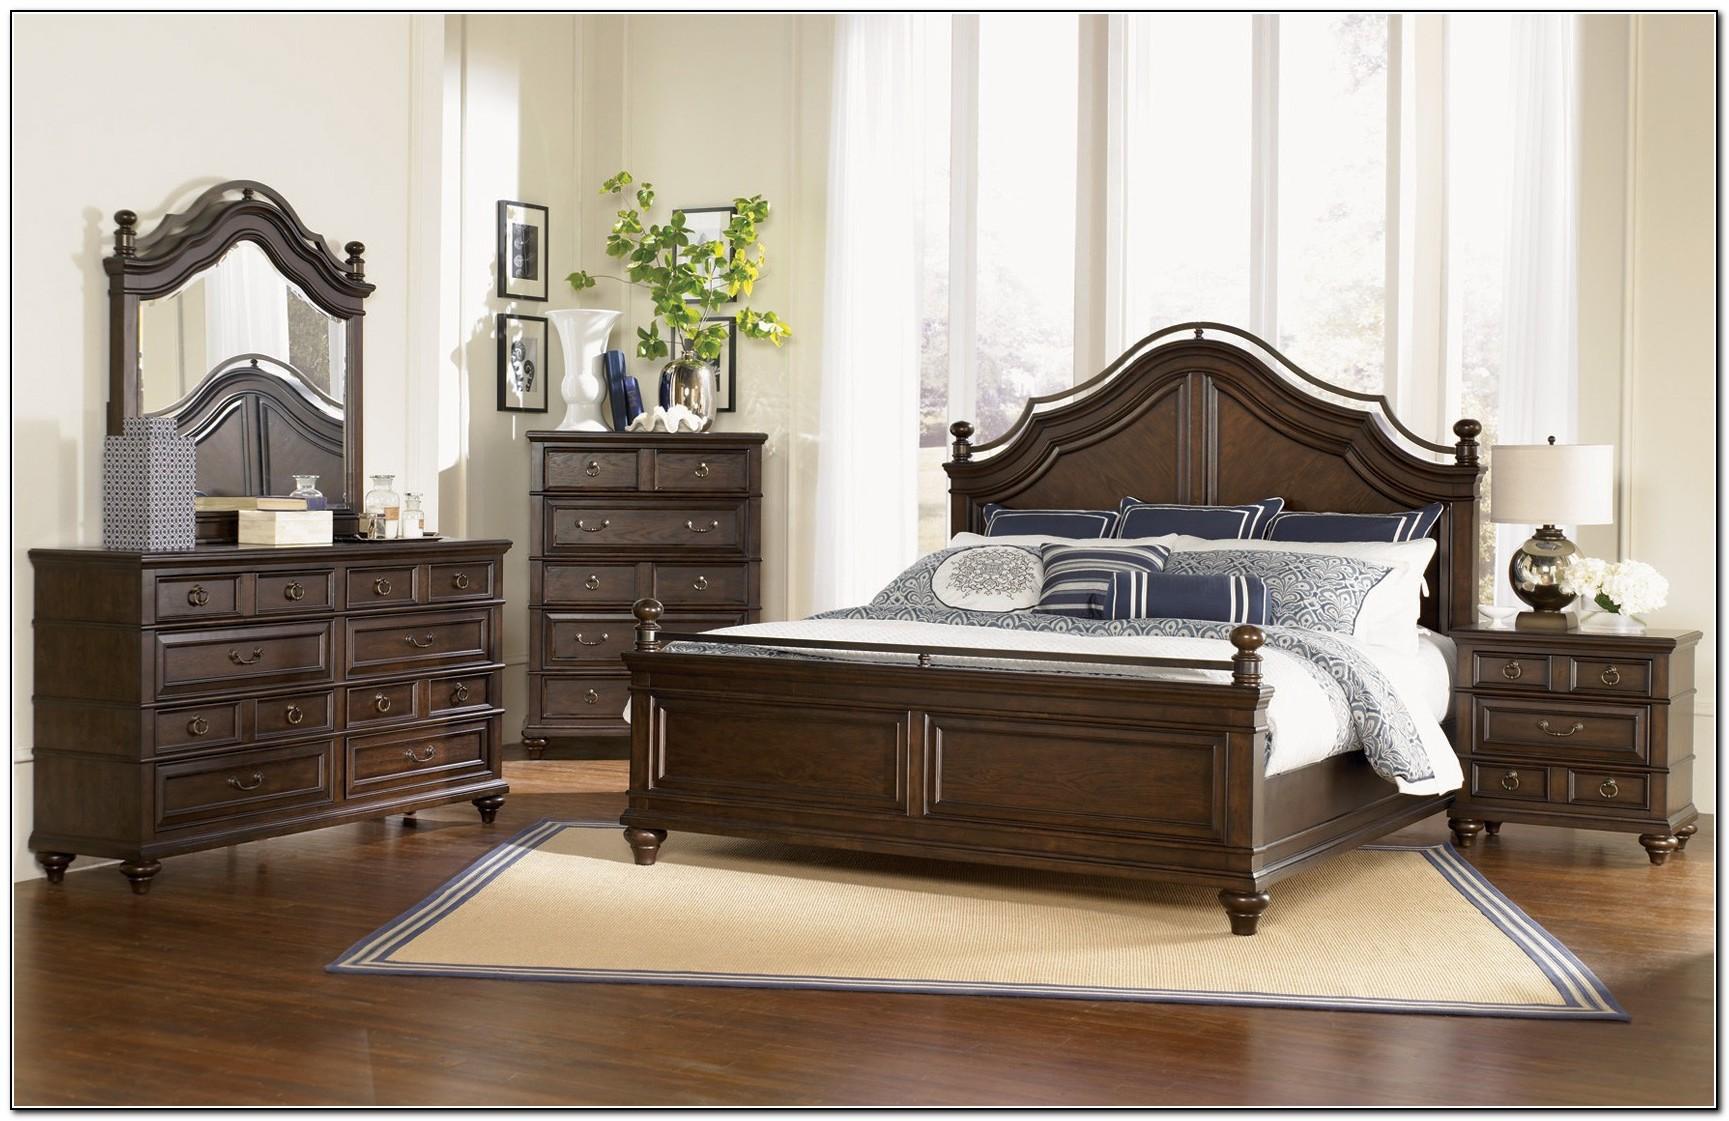 Queen Bed Frame Design